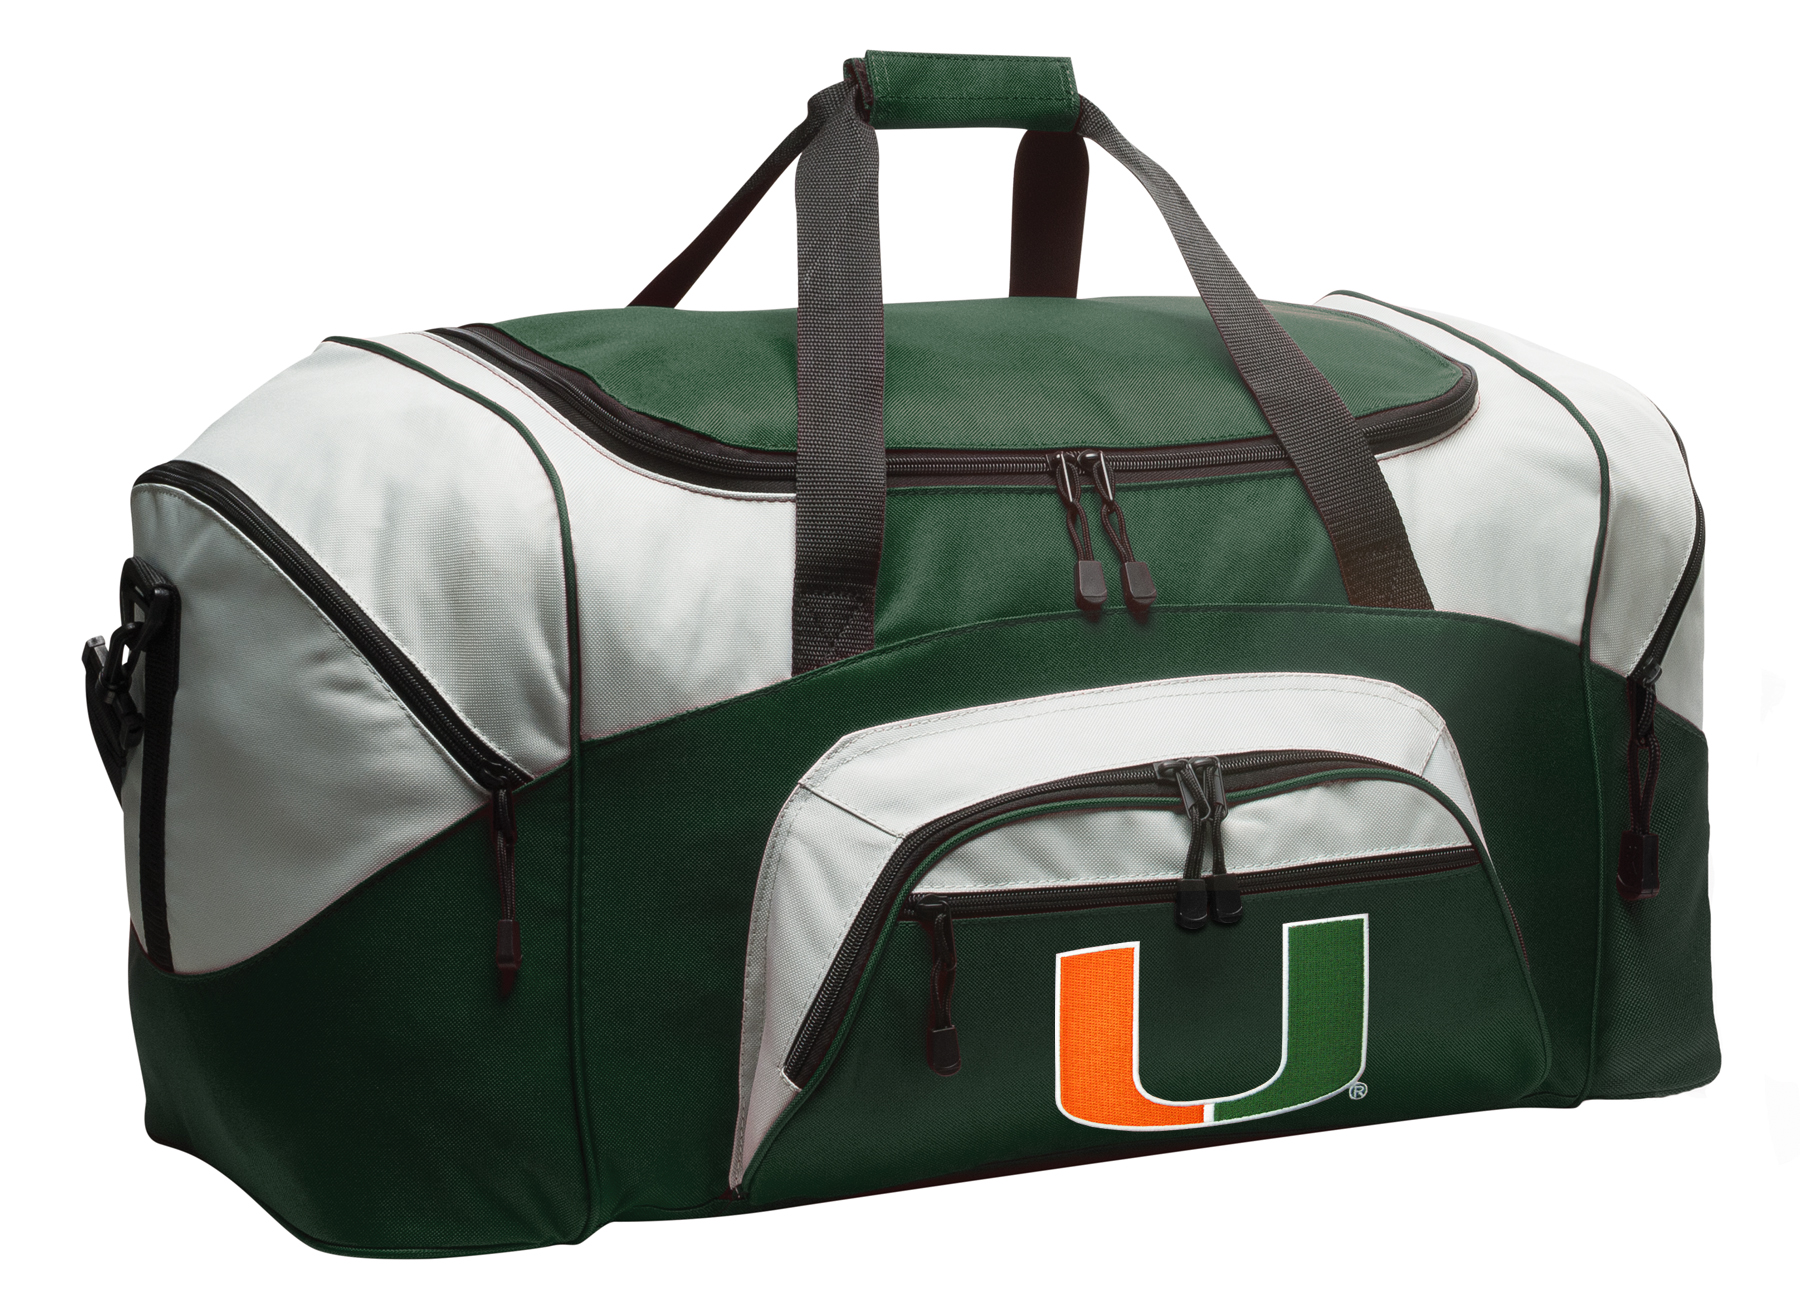 Miami Duffel Bag or University of Miami Gym Bag by